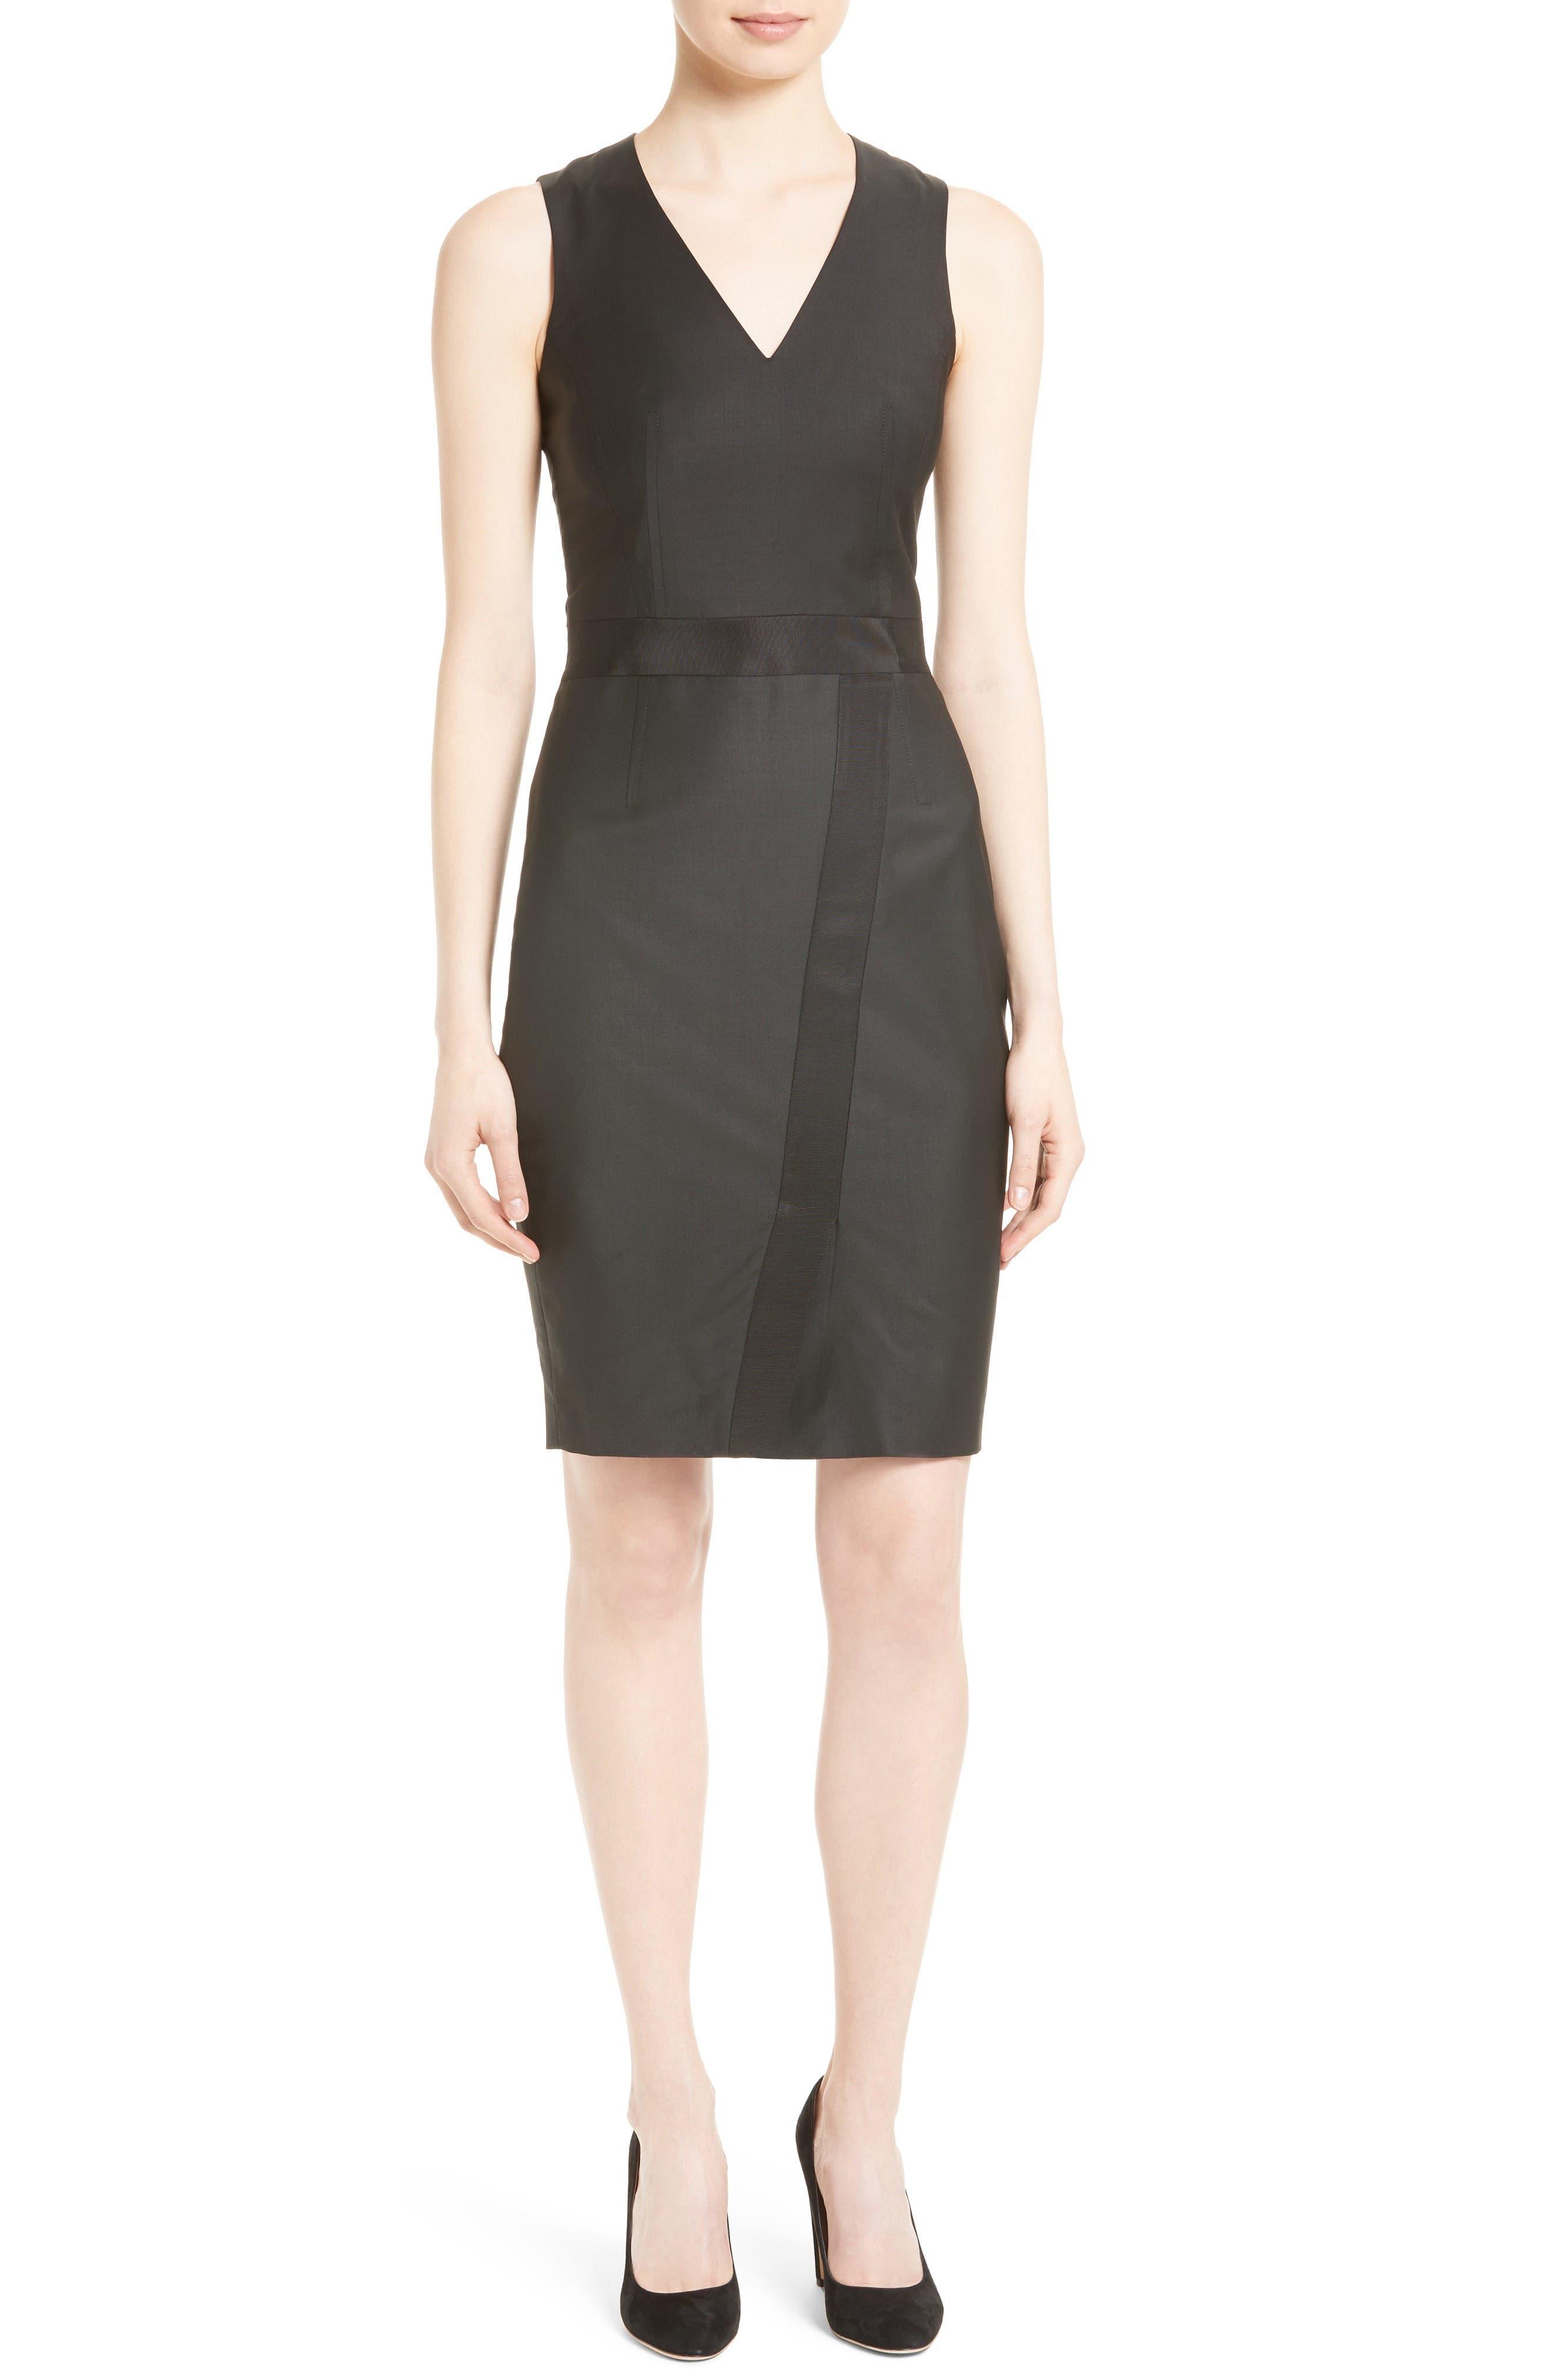 Alternate Image 1 Selected - Ted Baker London Tiornad Sheath Dress